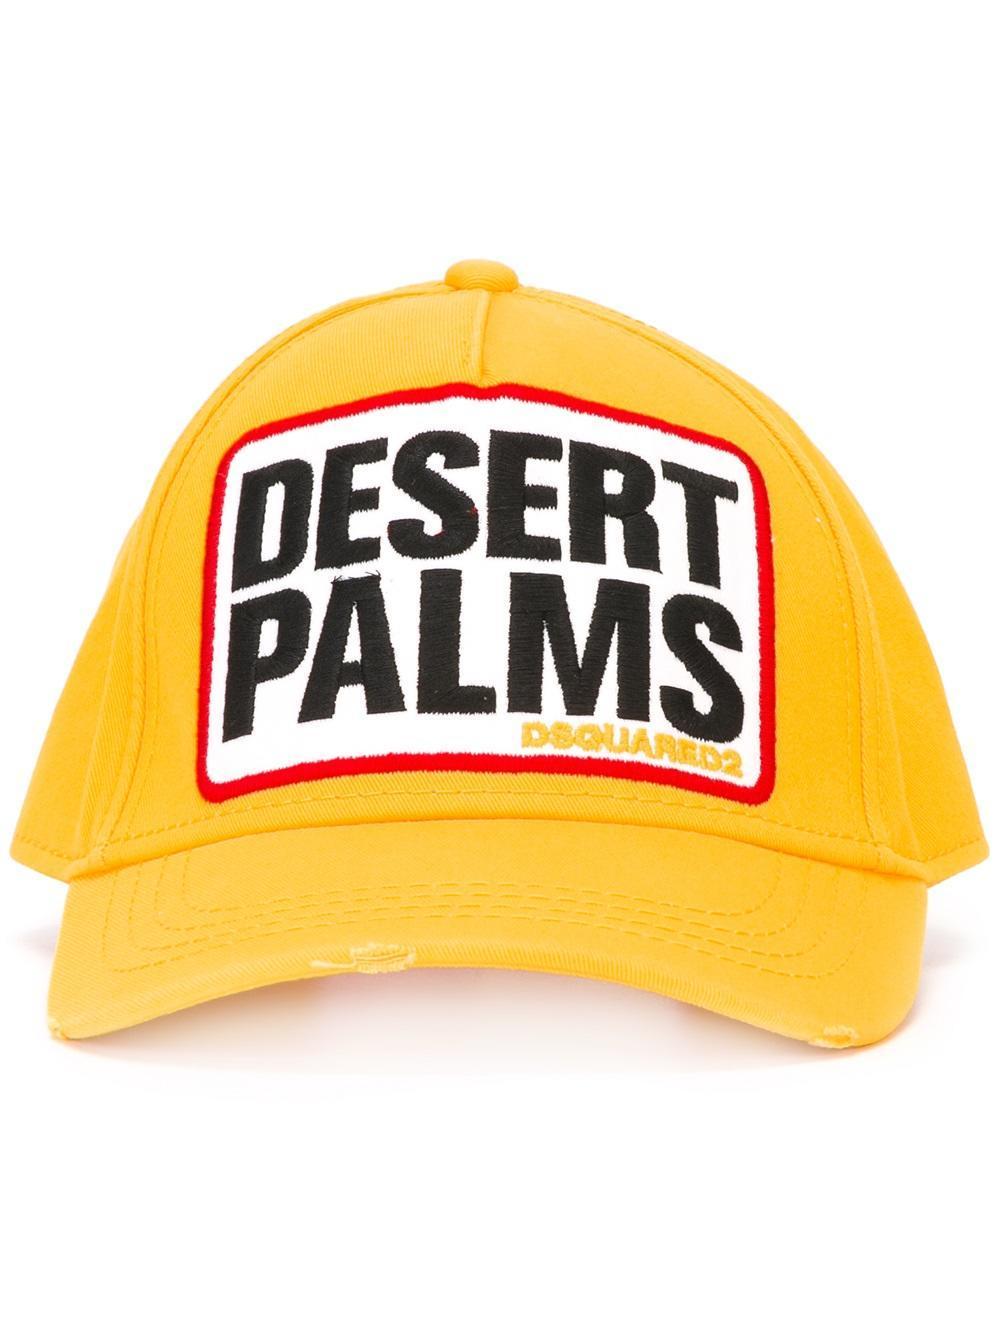 low priced 0fb86 ea404 DSquared² Desert Palms Baseball Cap in Yellow for Men - Lyst